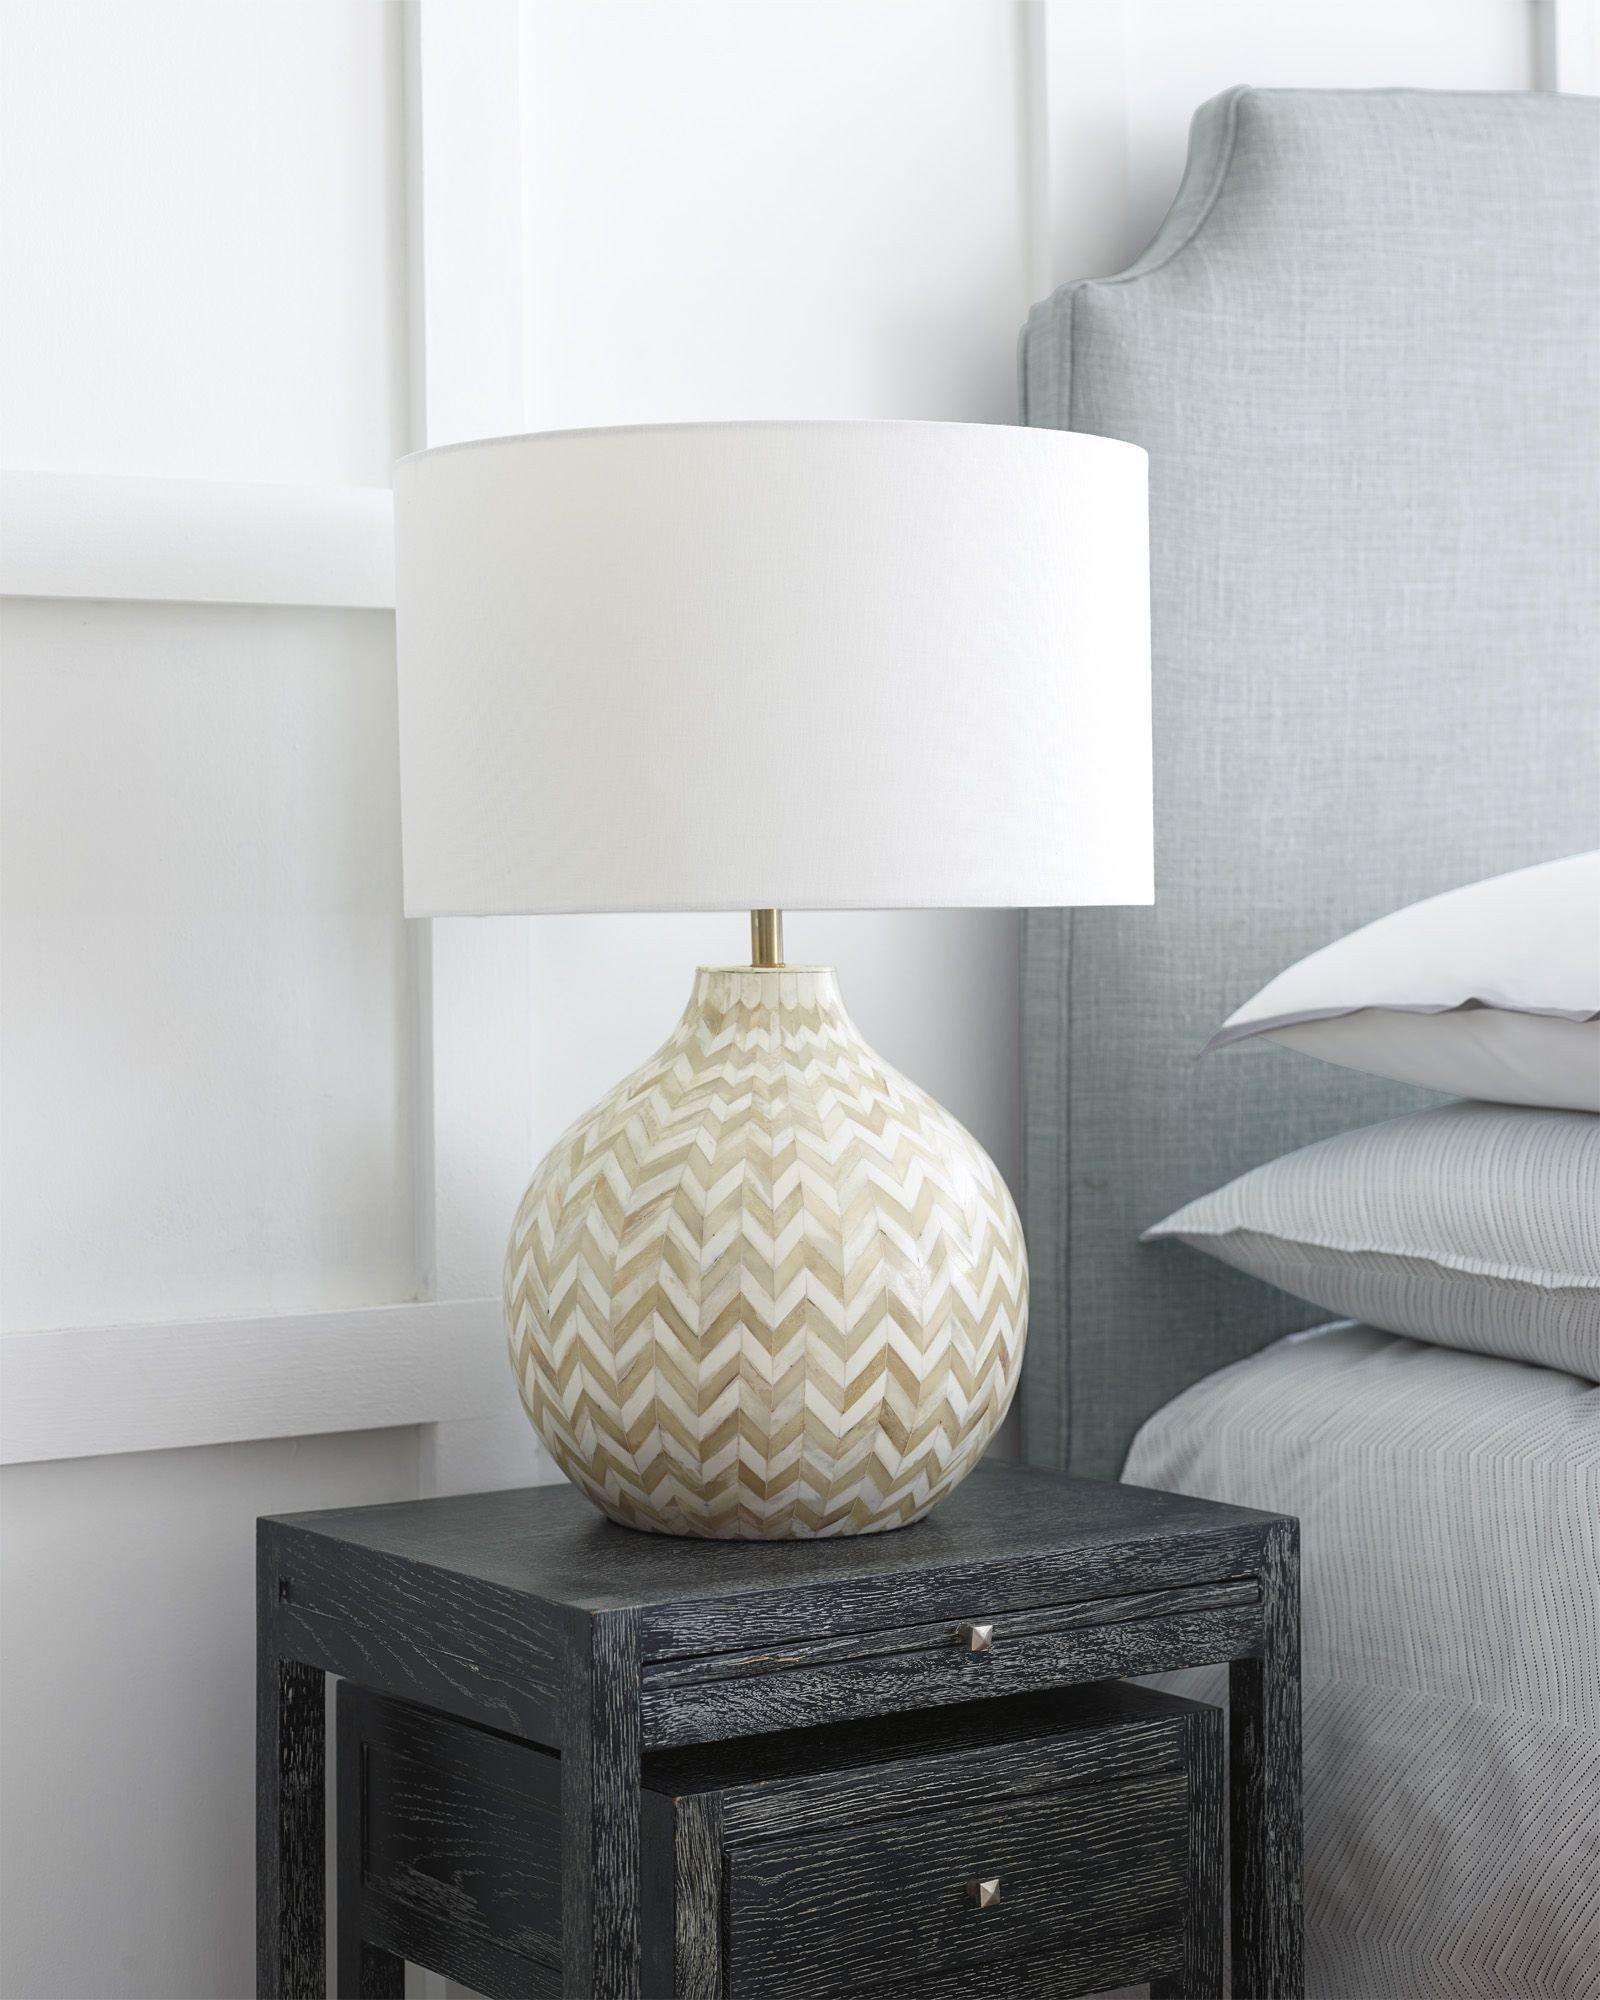 Touch Table Lamps Bedroom Luxury Bone Lamp Nightstand Bedroom Inspiration Via Serena